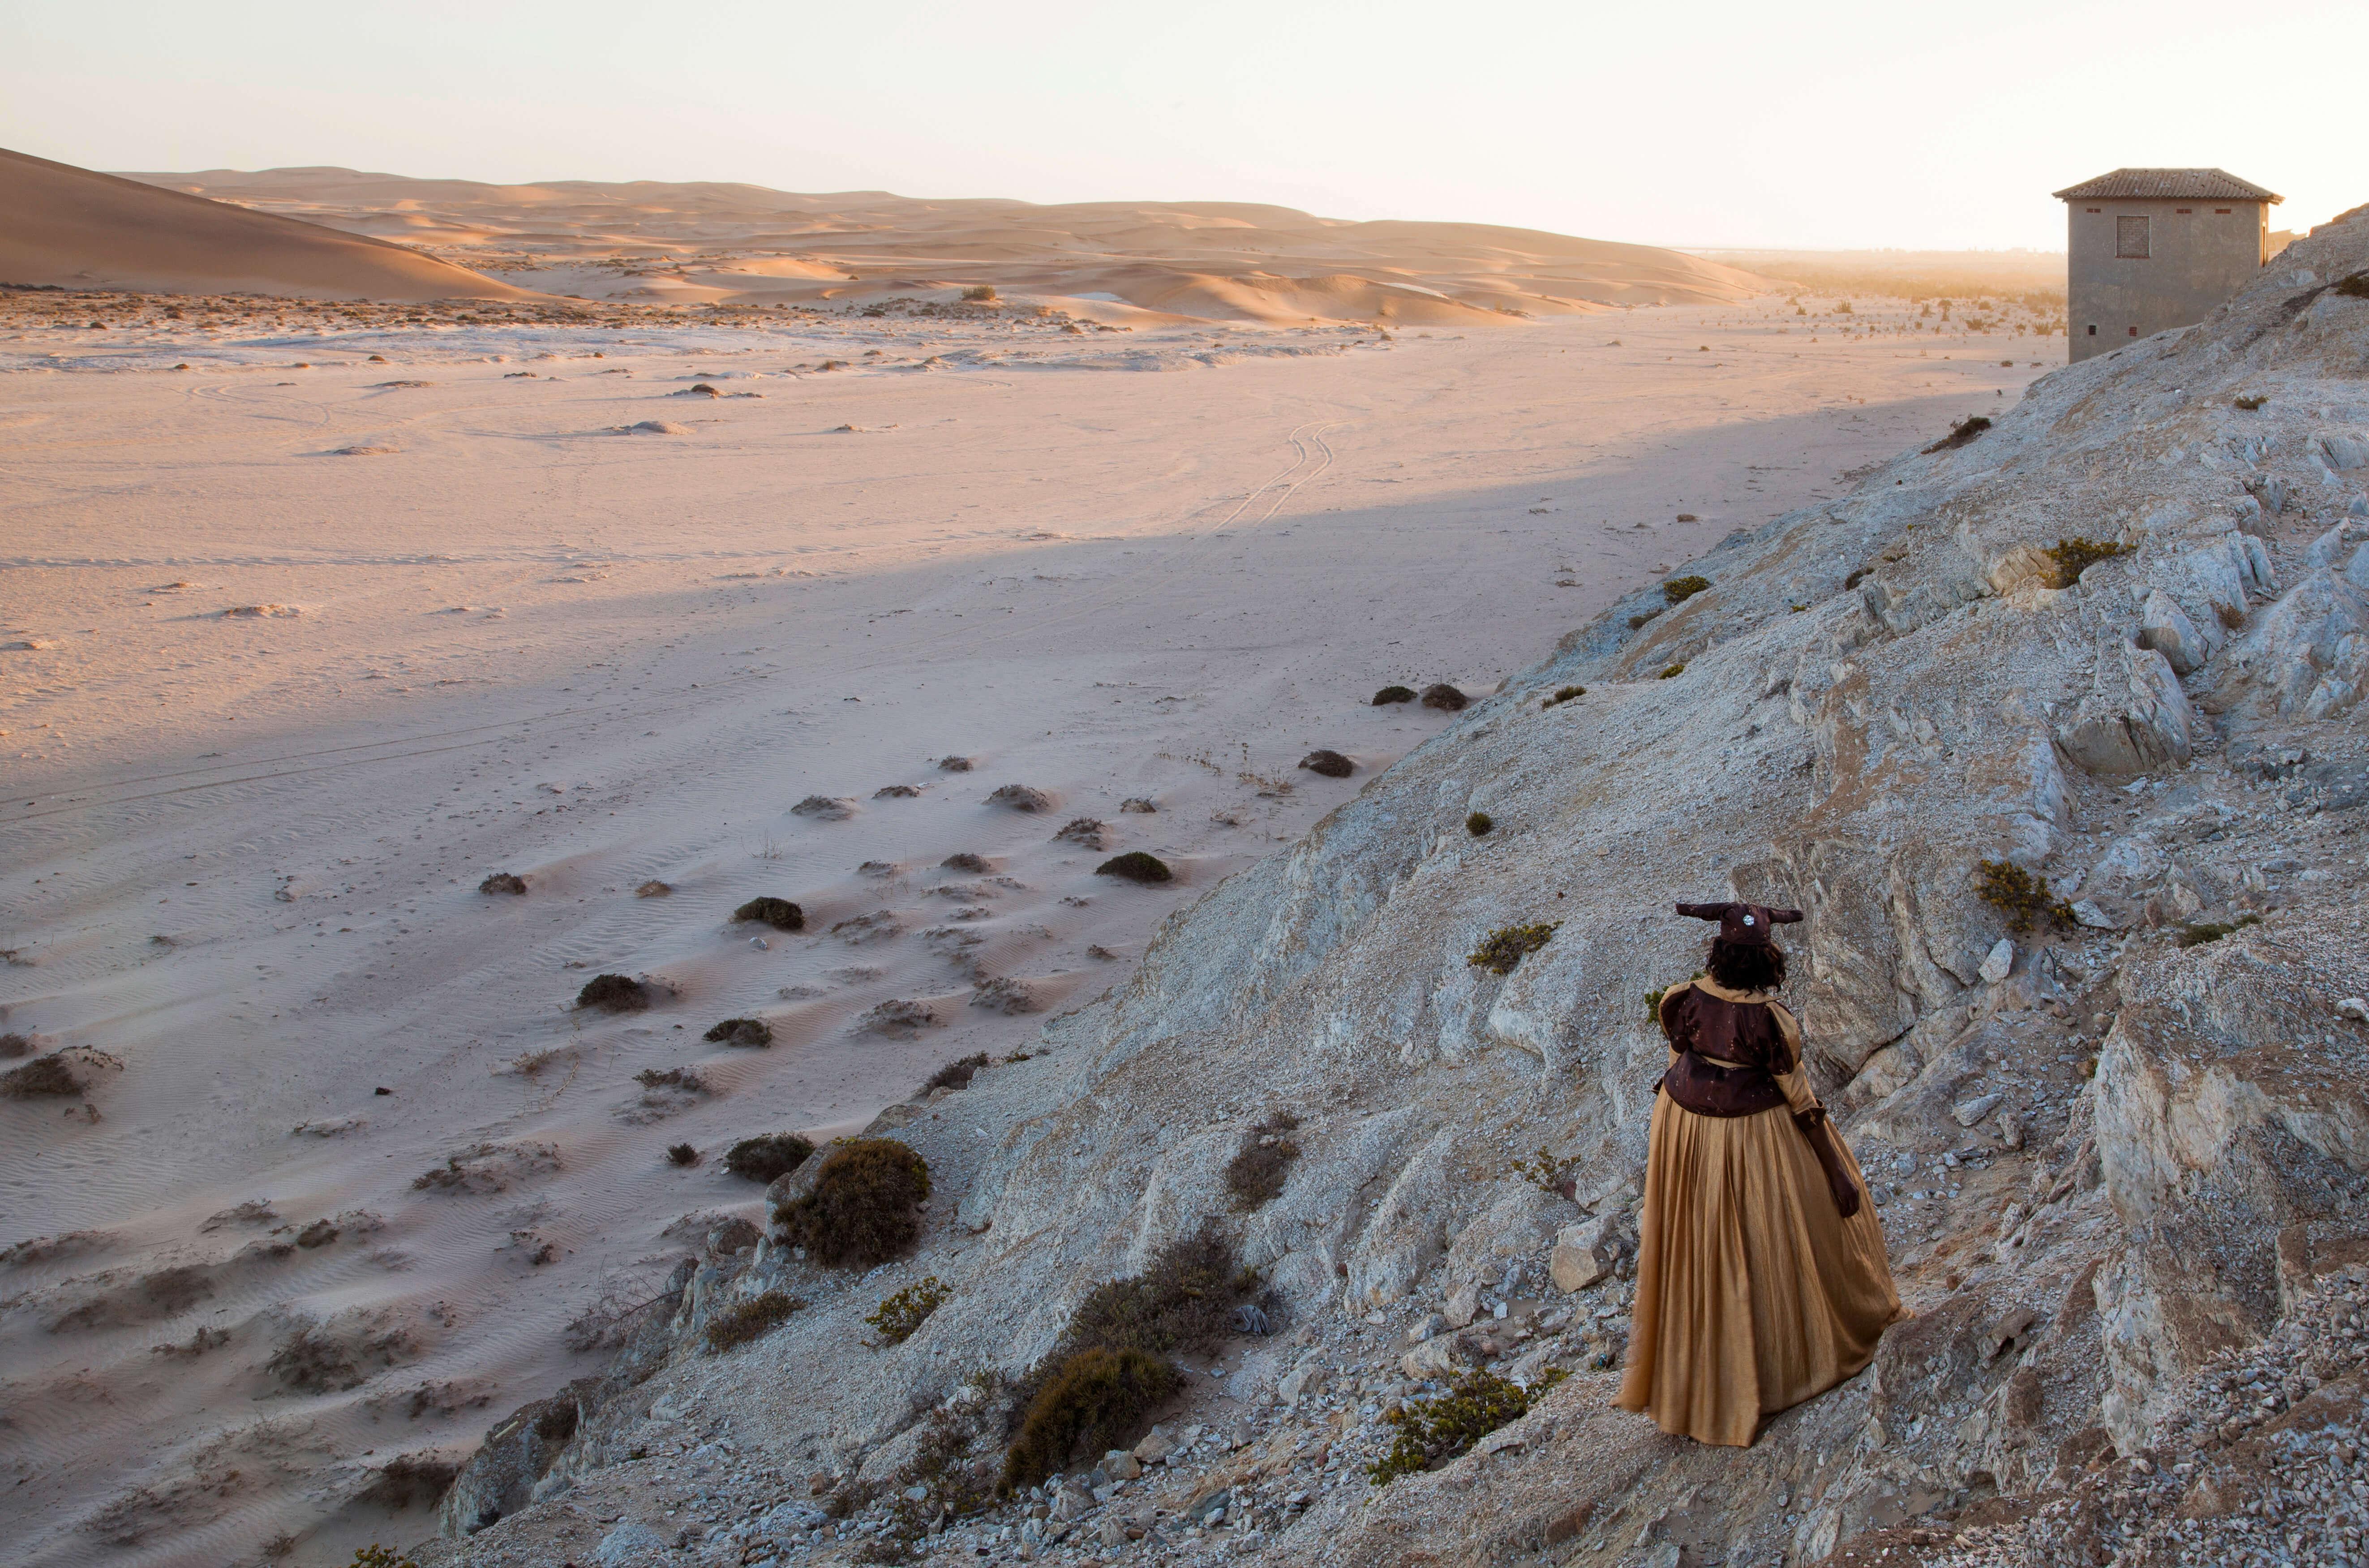 Nicola Brandt, Across the River,Uakondjisa Kakuekuee Mbari, Swakopmund, Namib Desert (2013), 73 x 100cm (paper size); 60 x 90cm (photo size), Digital Pigment Print, Edition of 3 + 2AP.